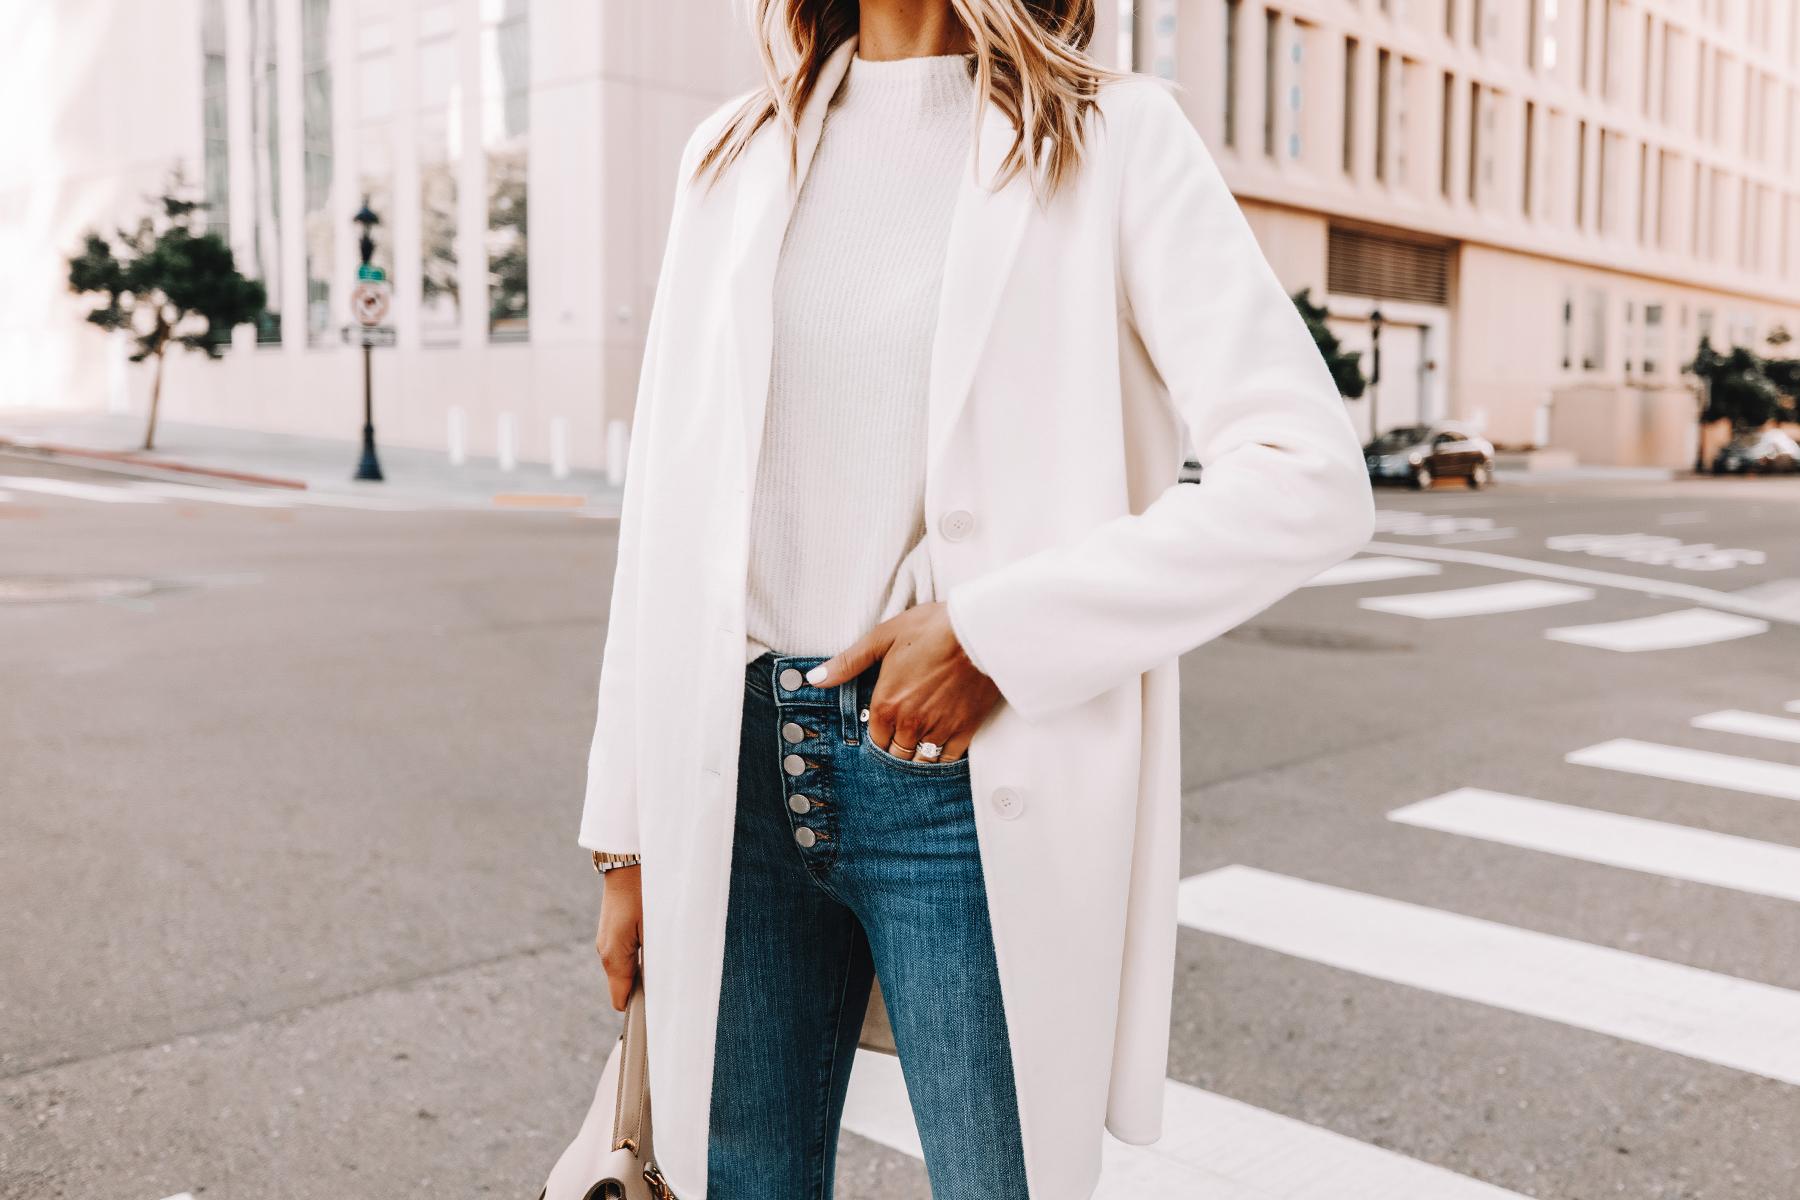 Fashion Jackson Wearing Banana Republic White Topcoat White Sweater Skinny Jeans